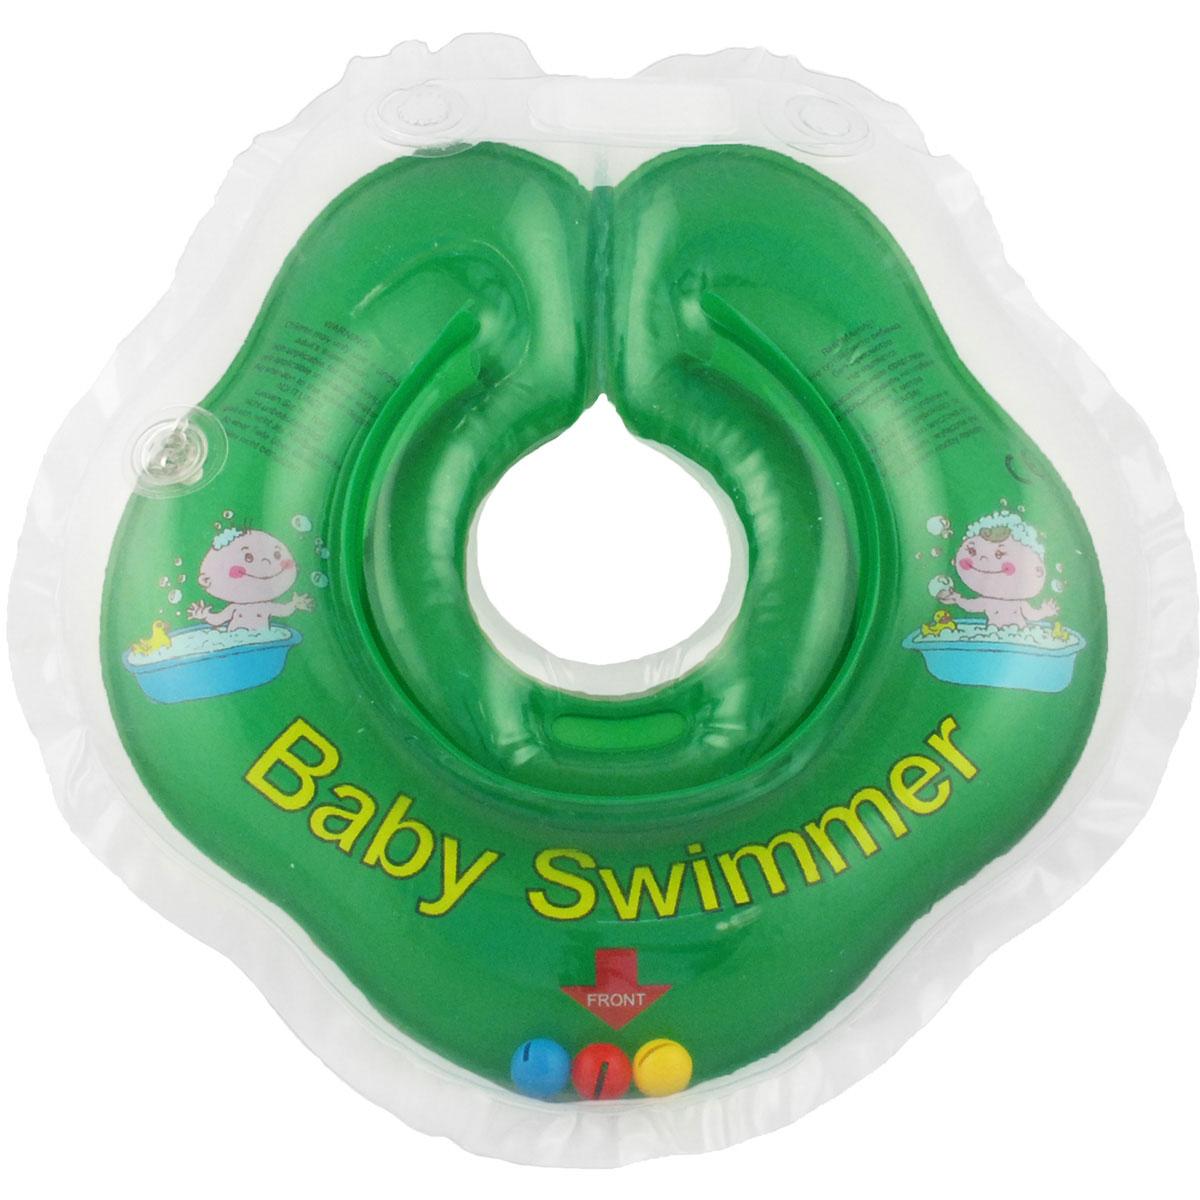 Baby Swimmer Круг на шею с погремушкой цвет зеленый 3-12 кг -  Круги для купания